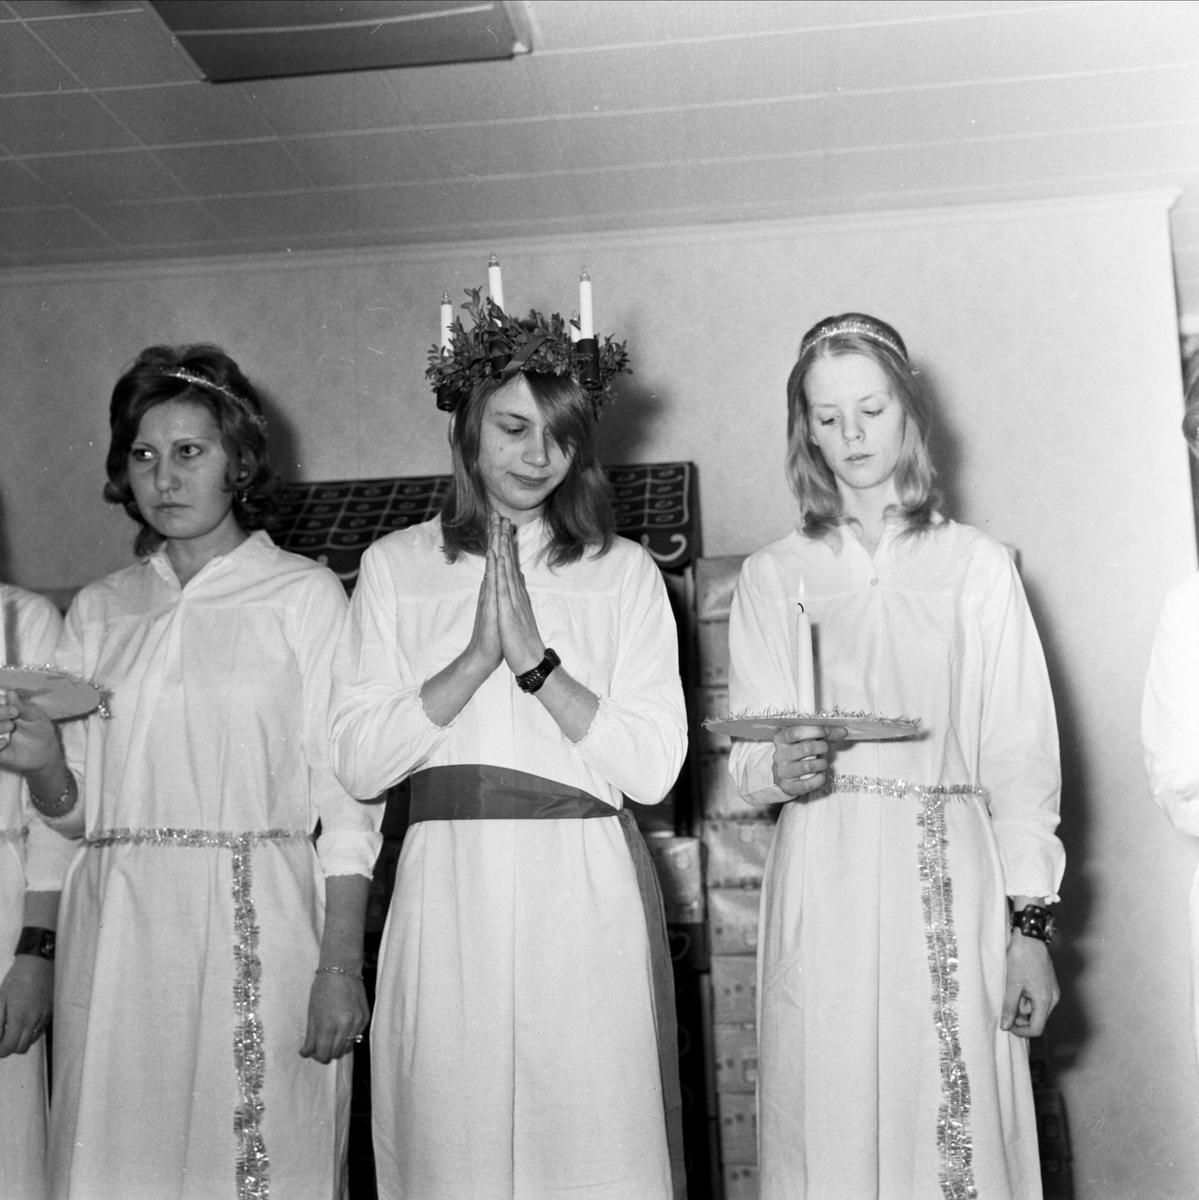 Luciatåg på Pricks Bagerier AB:s julfest, Tierp, Uppland 1973